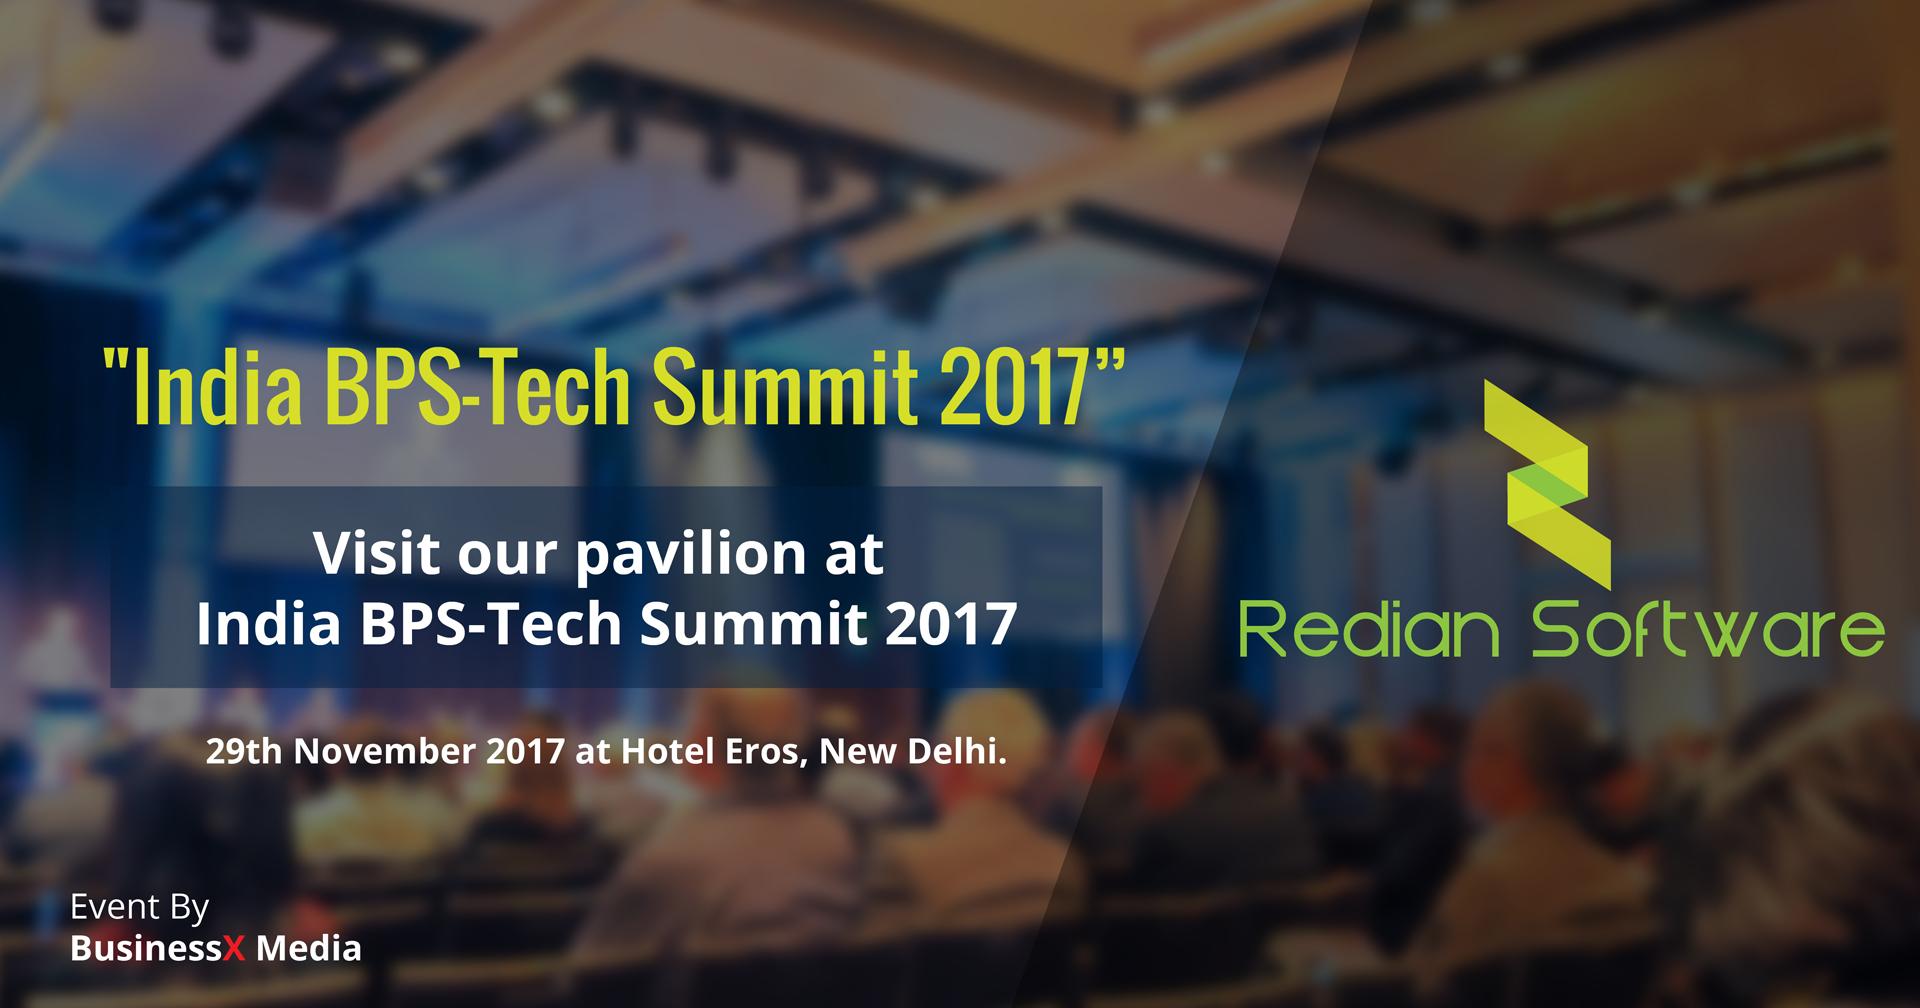 India BPS Summit 2017